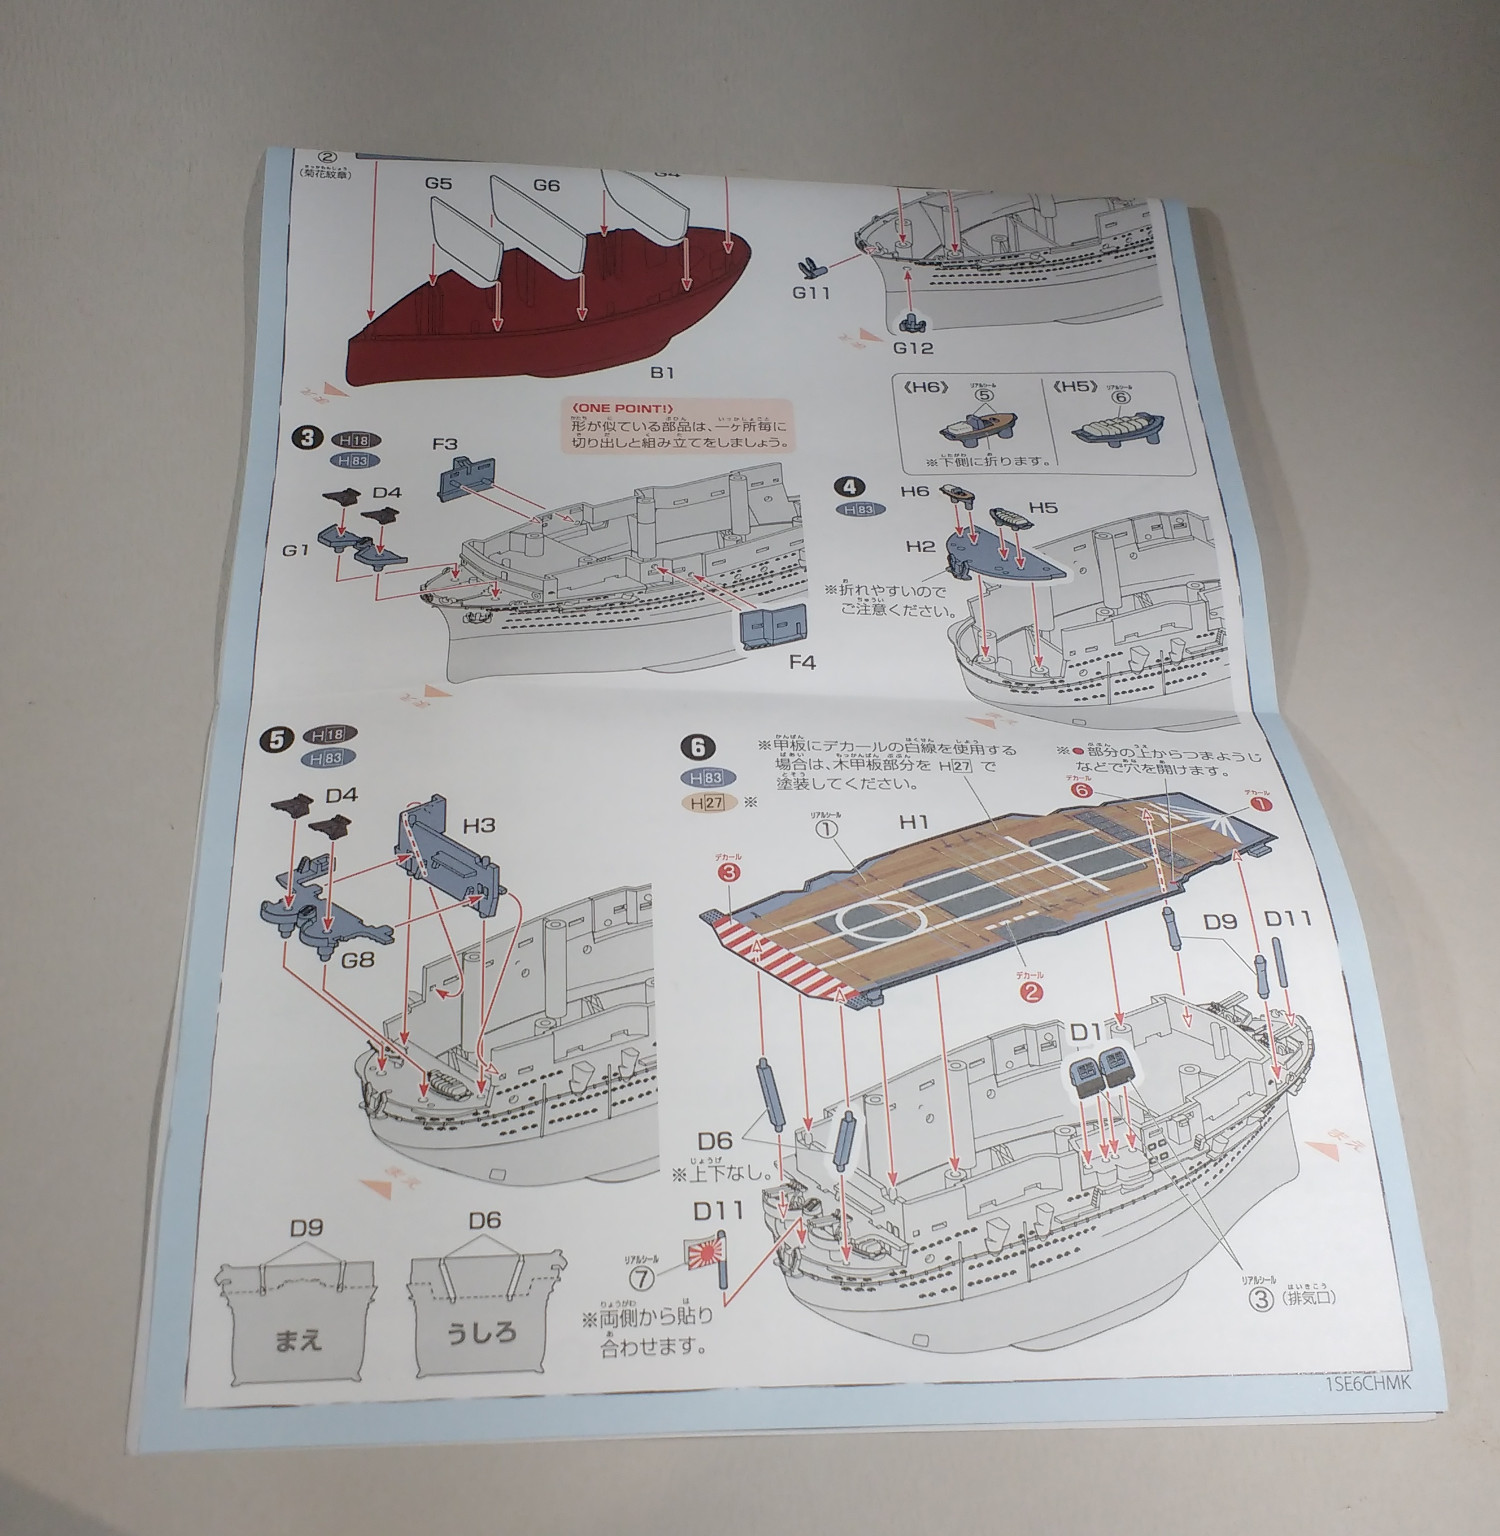 Porte-avions Zuikaku Toons - Fujimi TjgqLb-grappetoon11